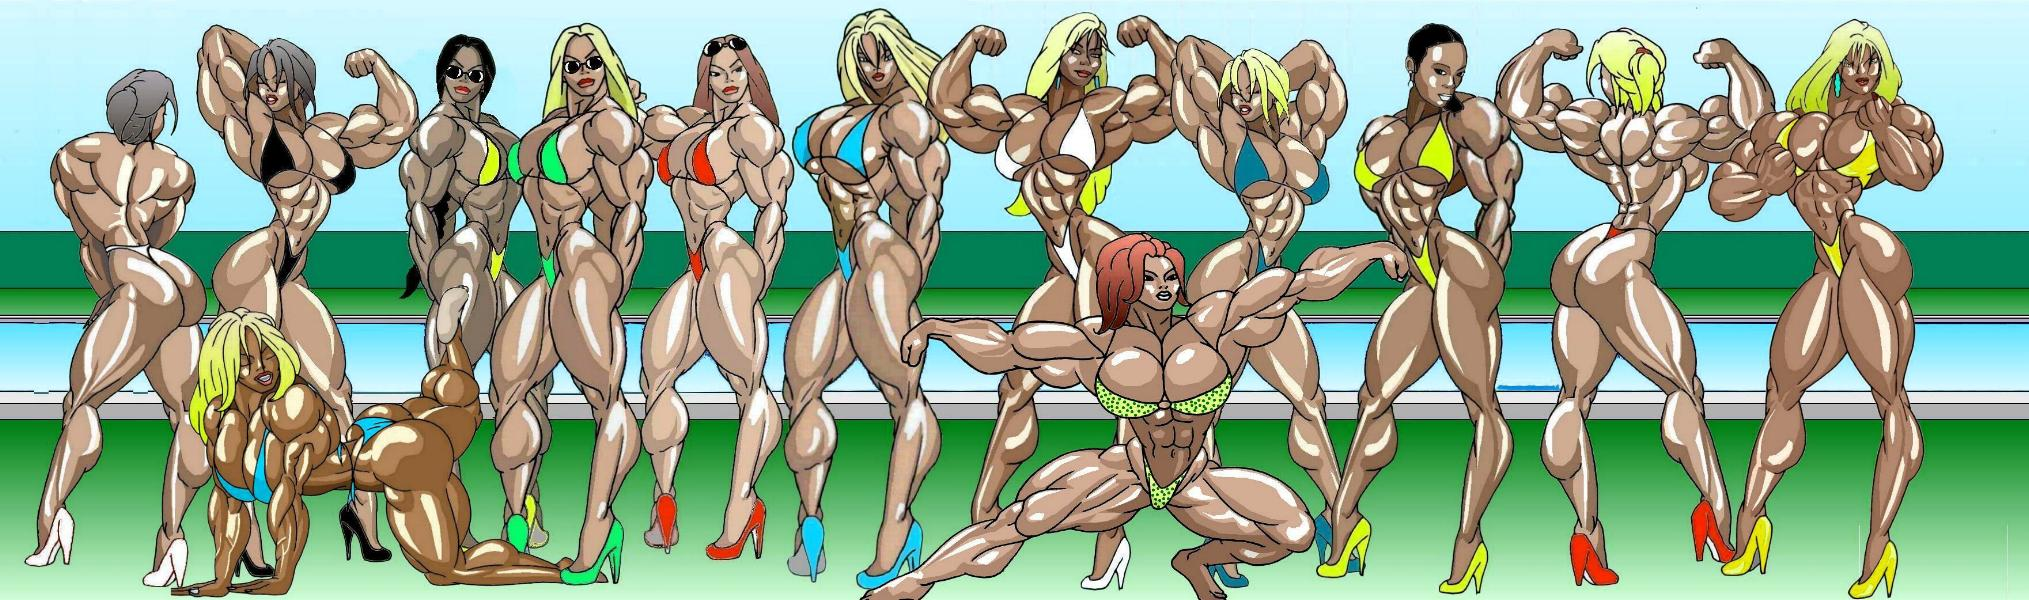 Секс мускулы онлайн, в анус пизду над качеством